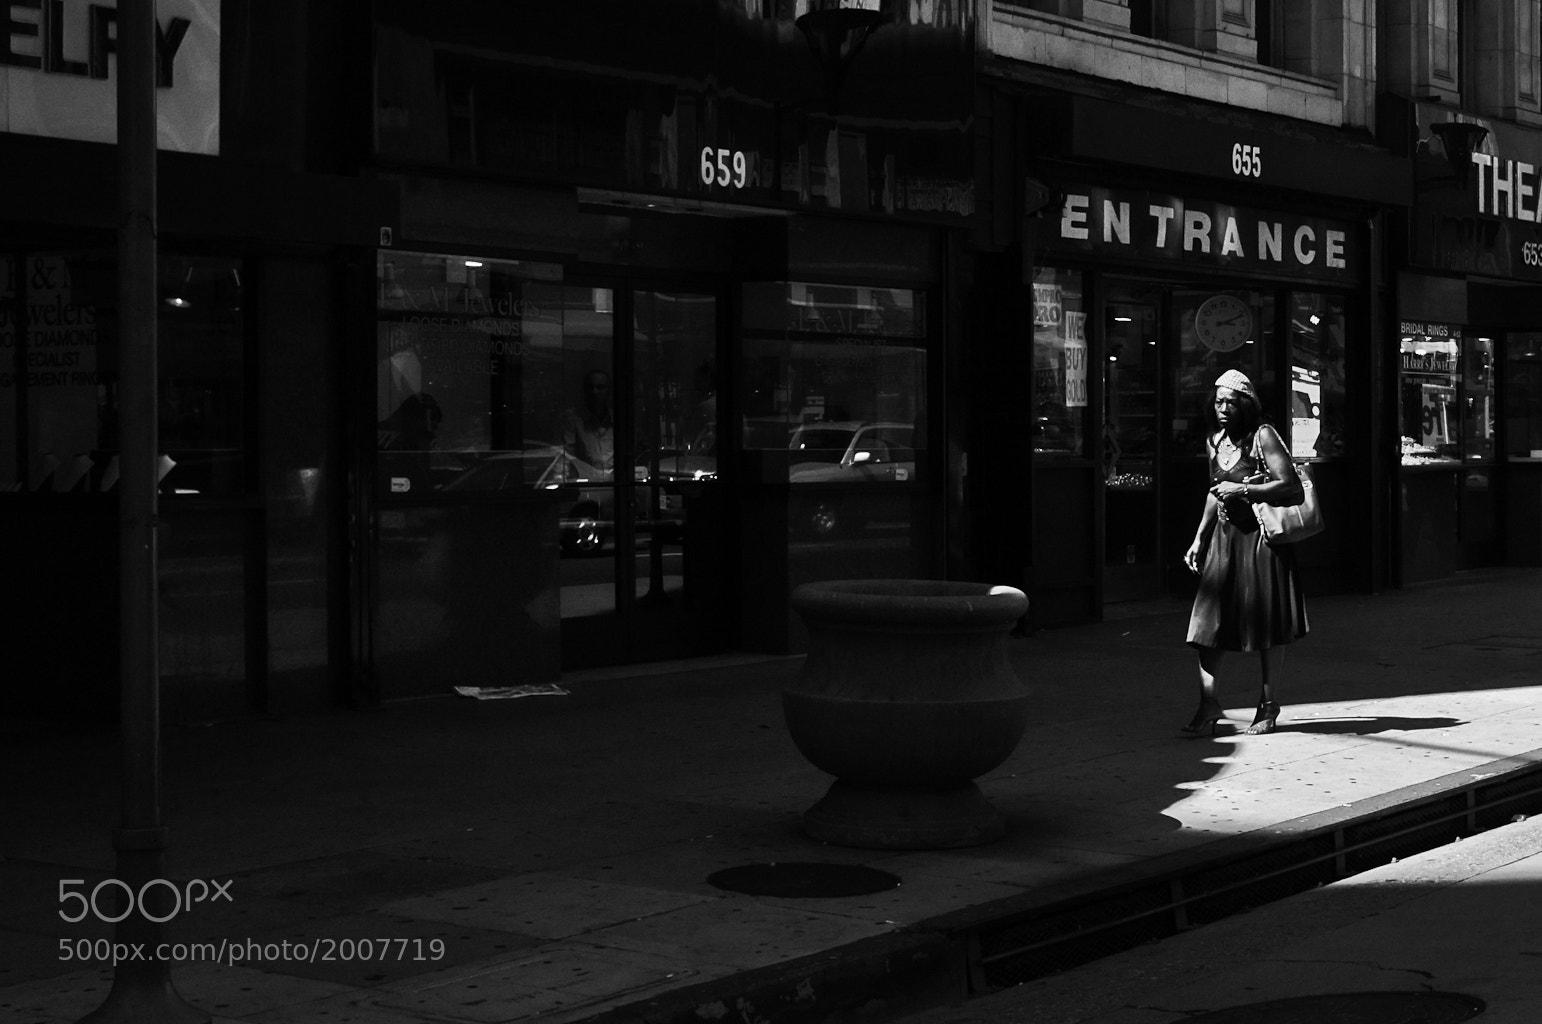 Photograph Entrance by Rinzi Ruiz on 500px